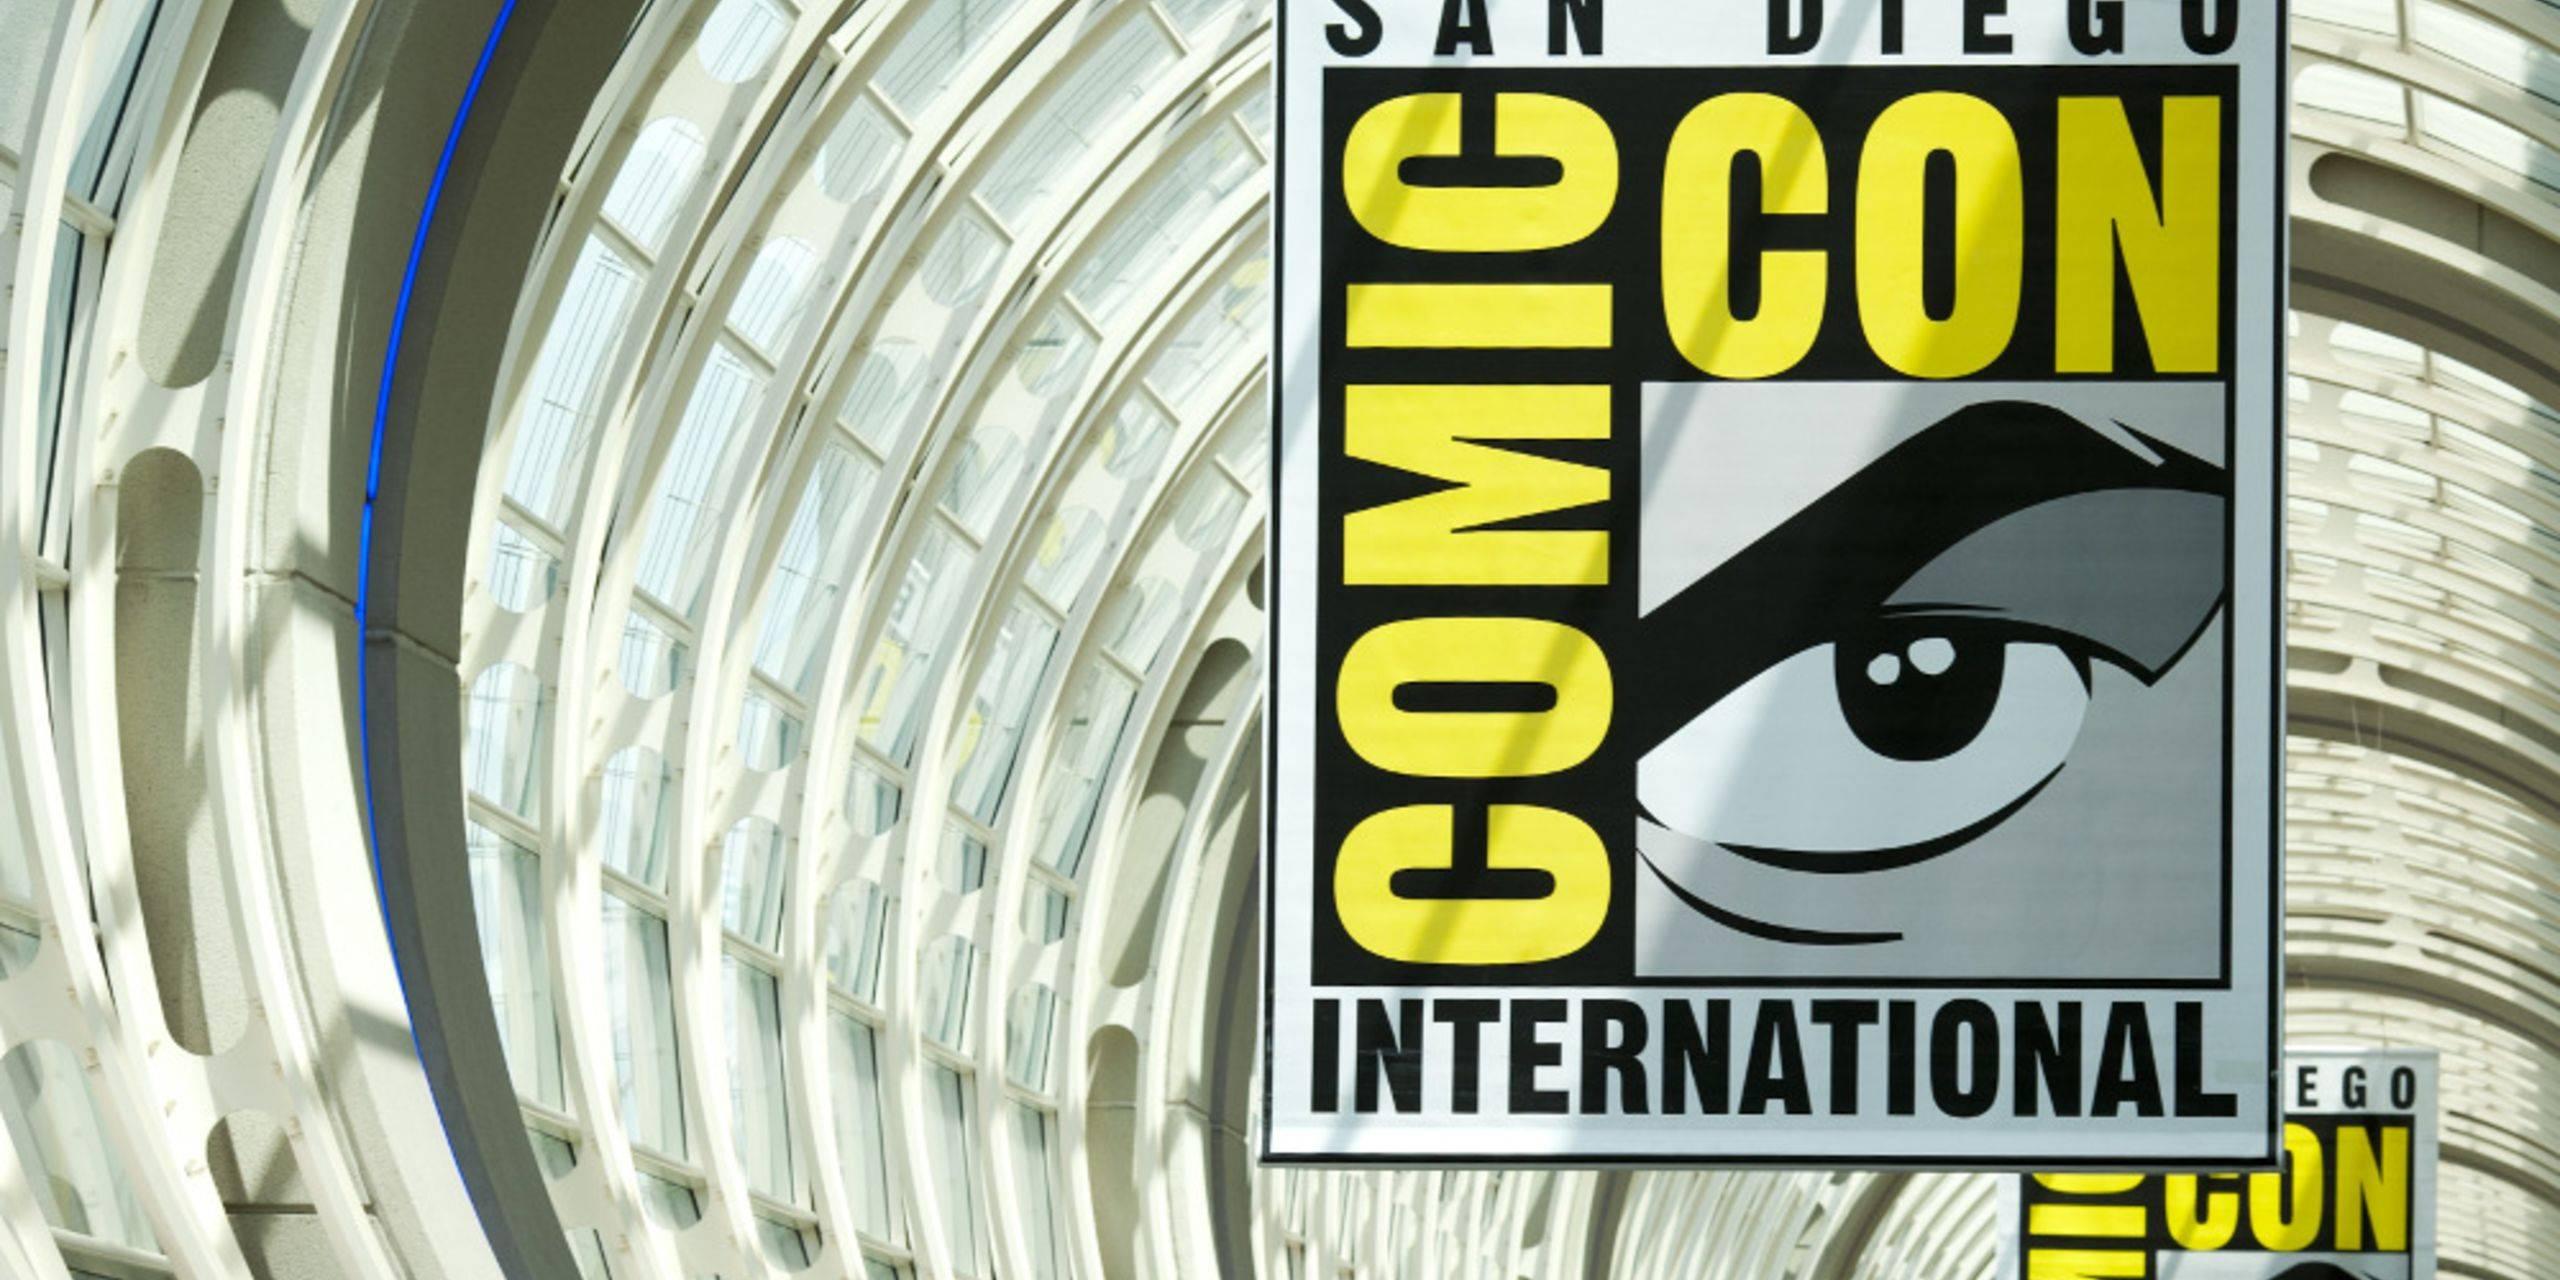 San Diego Comic-Con 2018